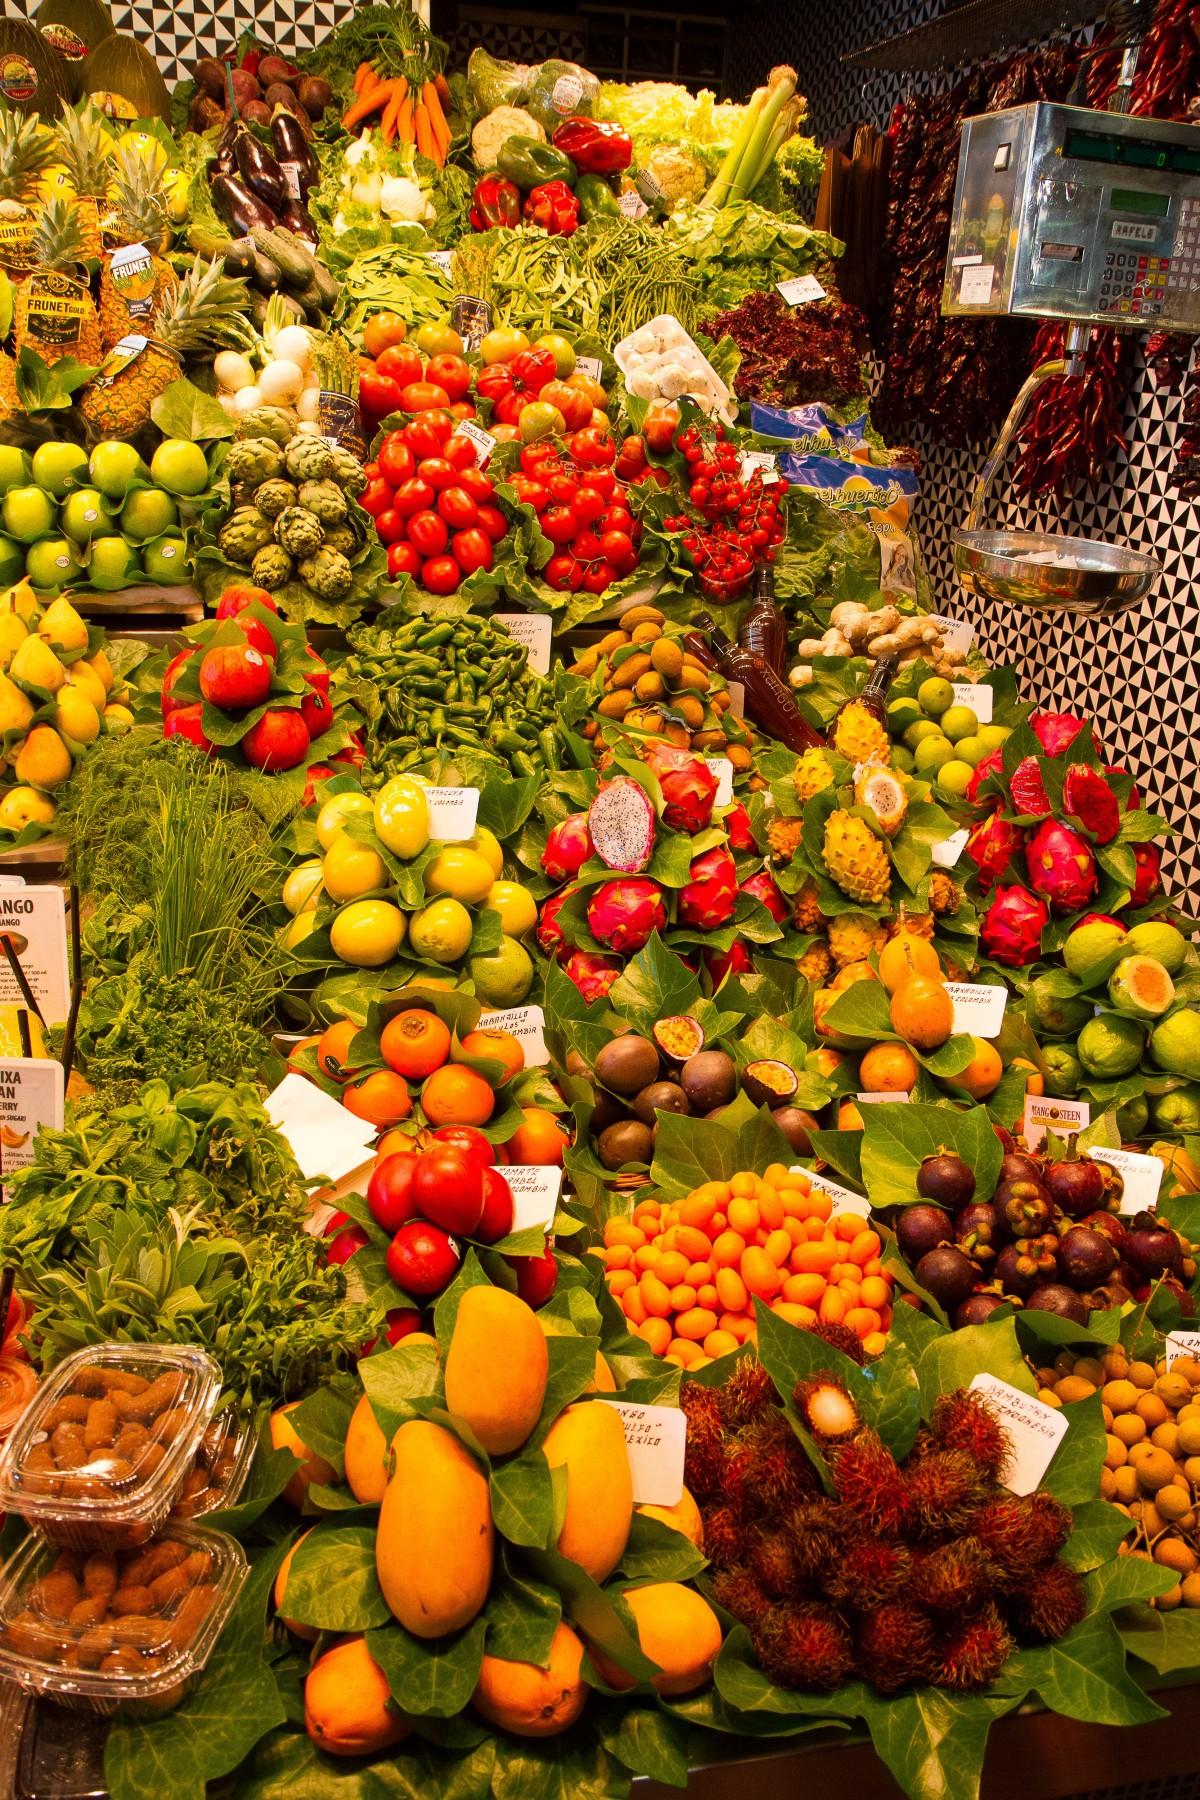 Free Images  fruit flower city produce autumn market